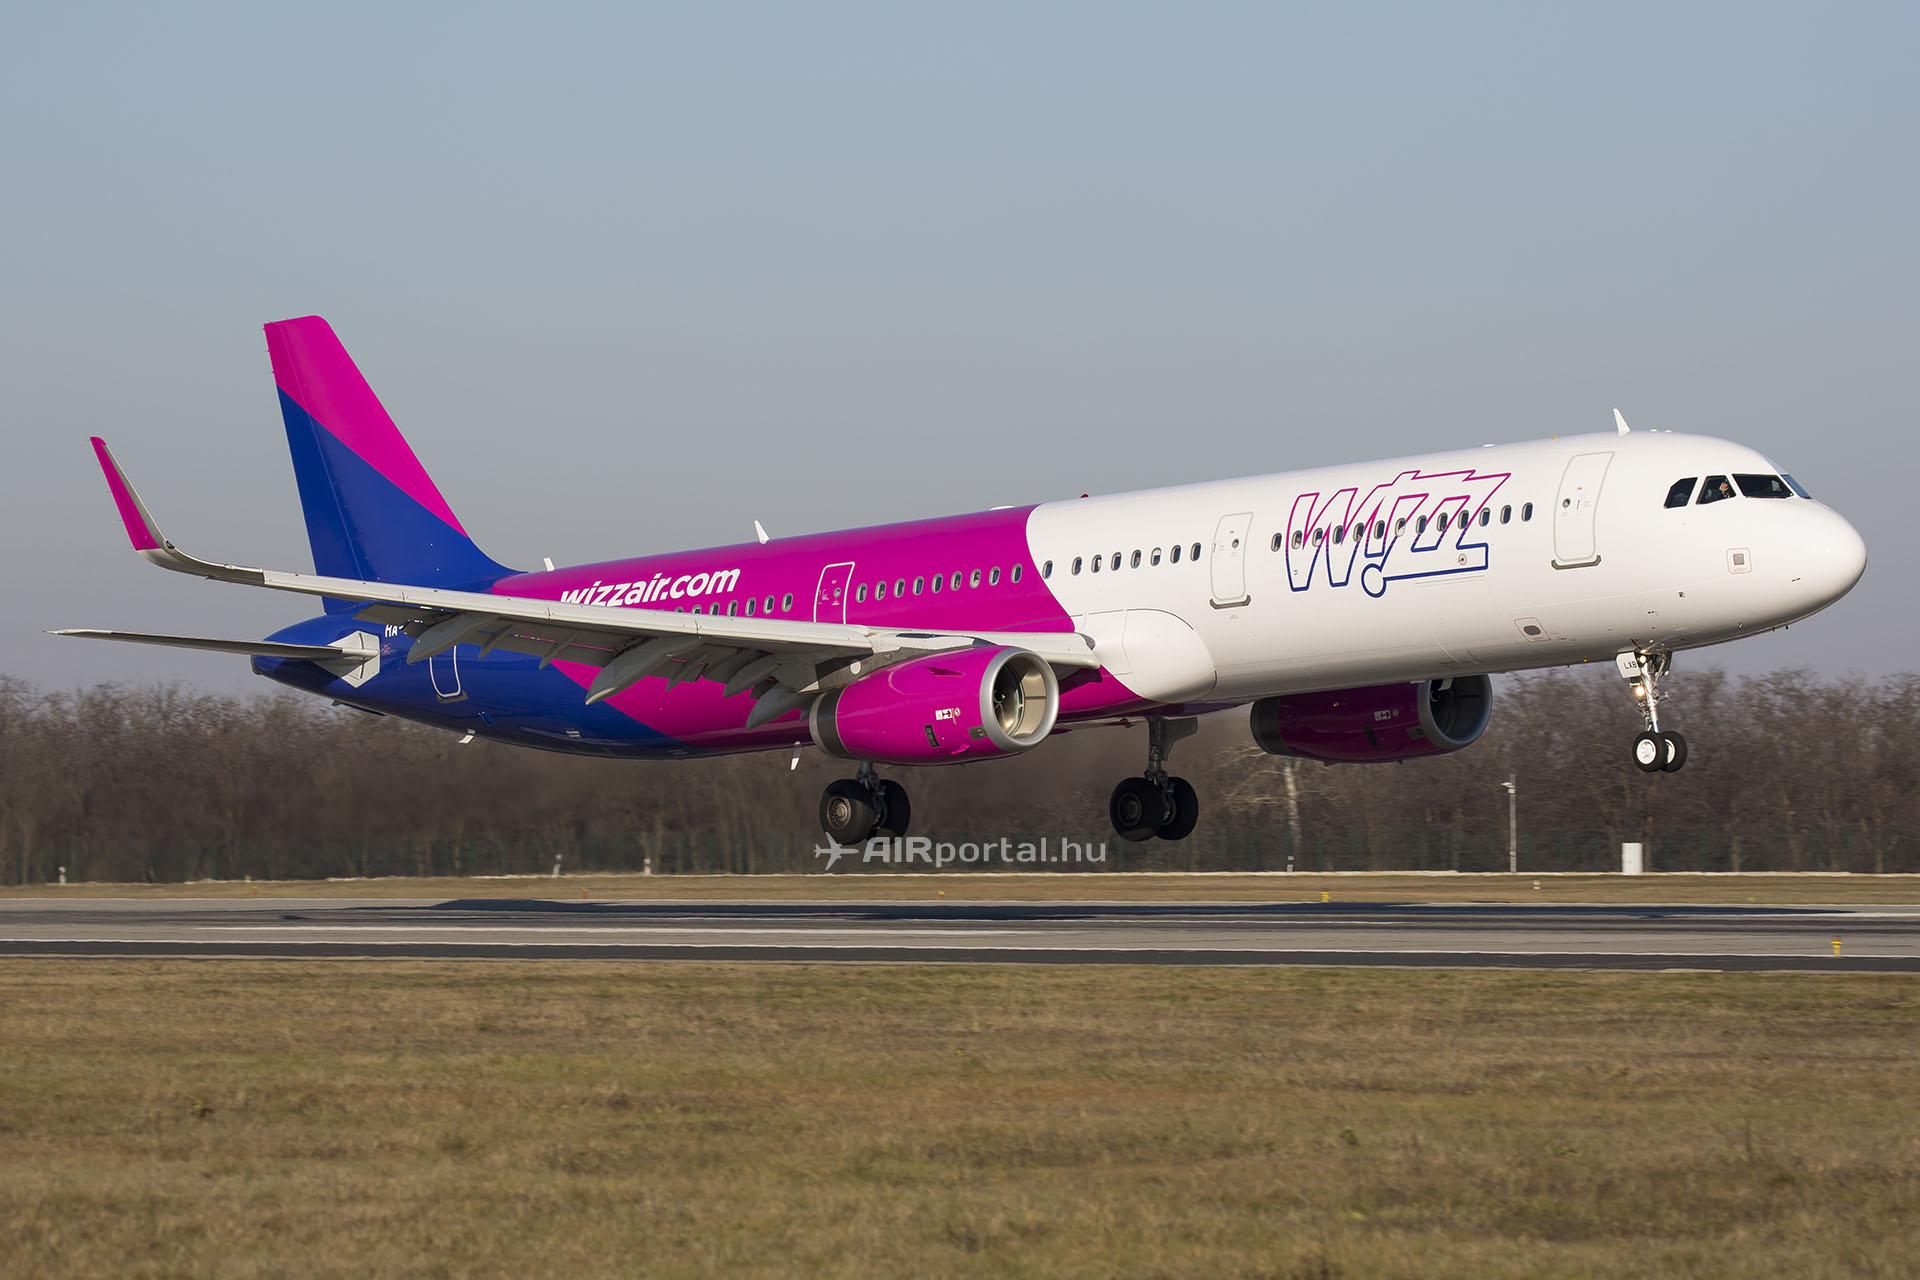 A Wizz Air Airbus A321-es repülőgépe Budapesten. (Fotó: AIRportal.hu) | © AIRportal.hu